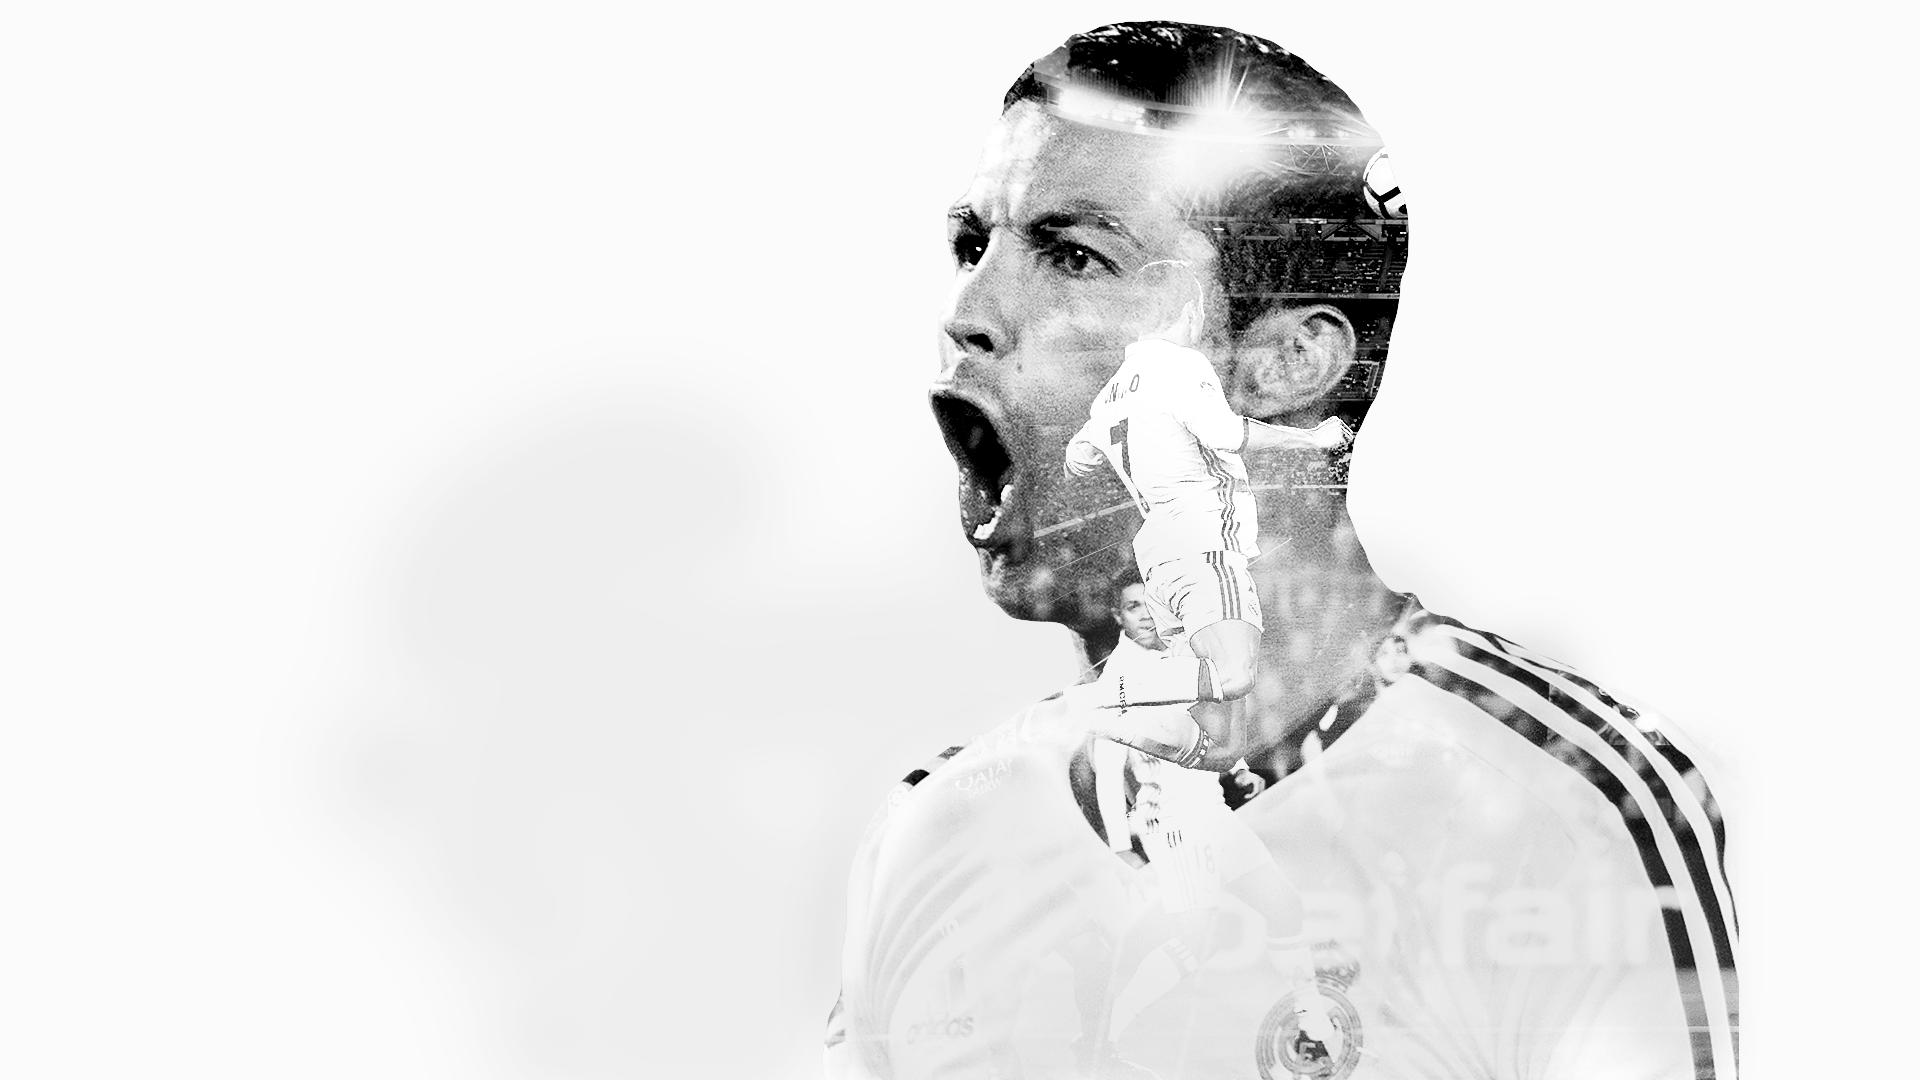 1920x1080 Ronaldo And Messi